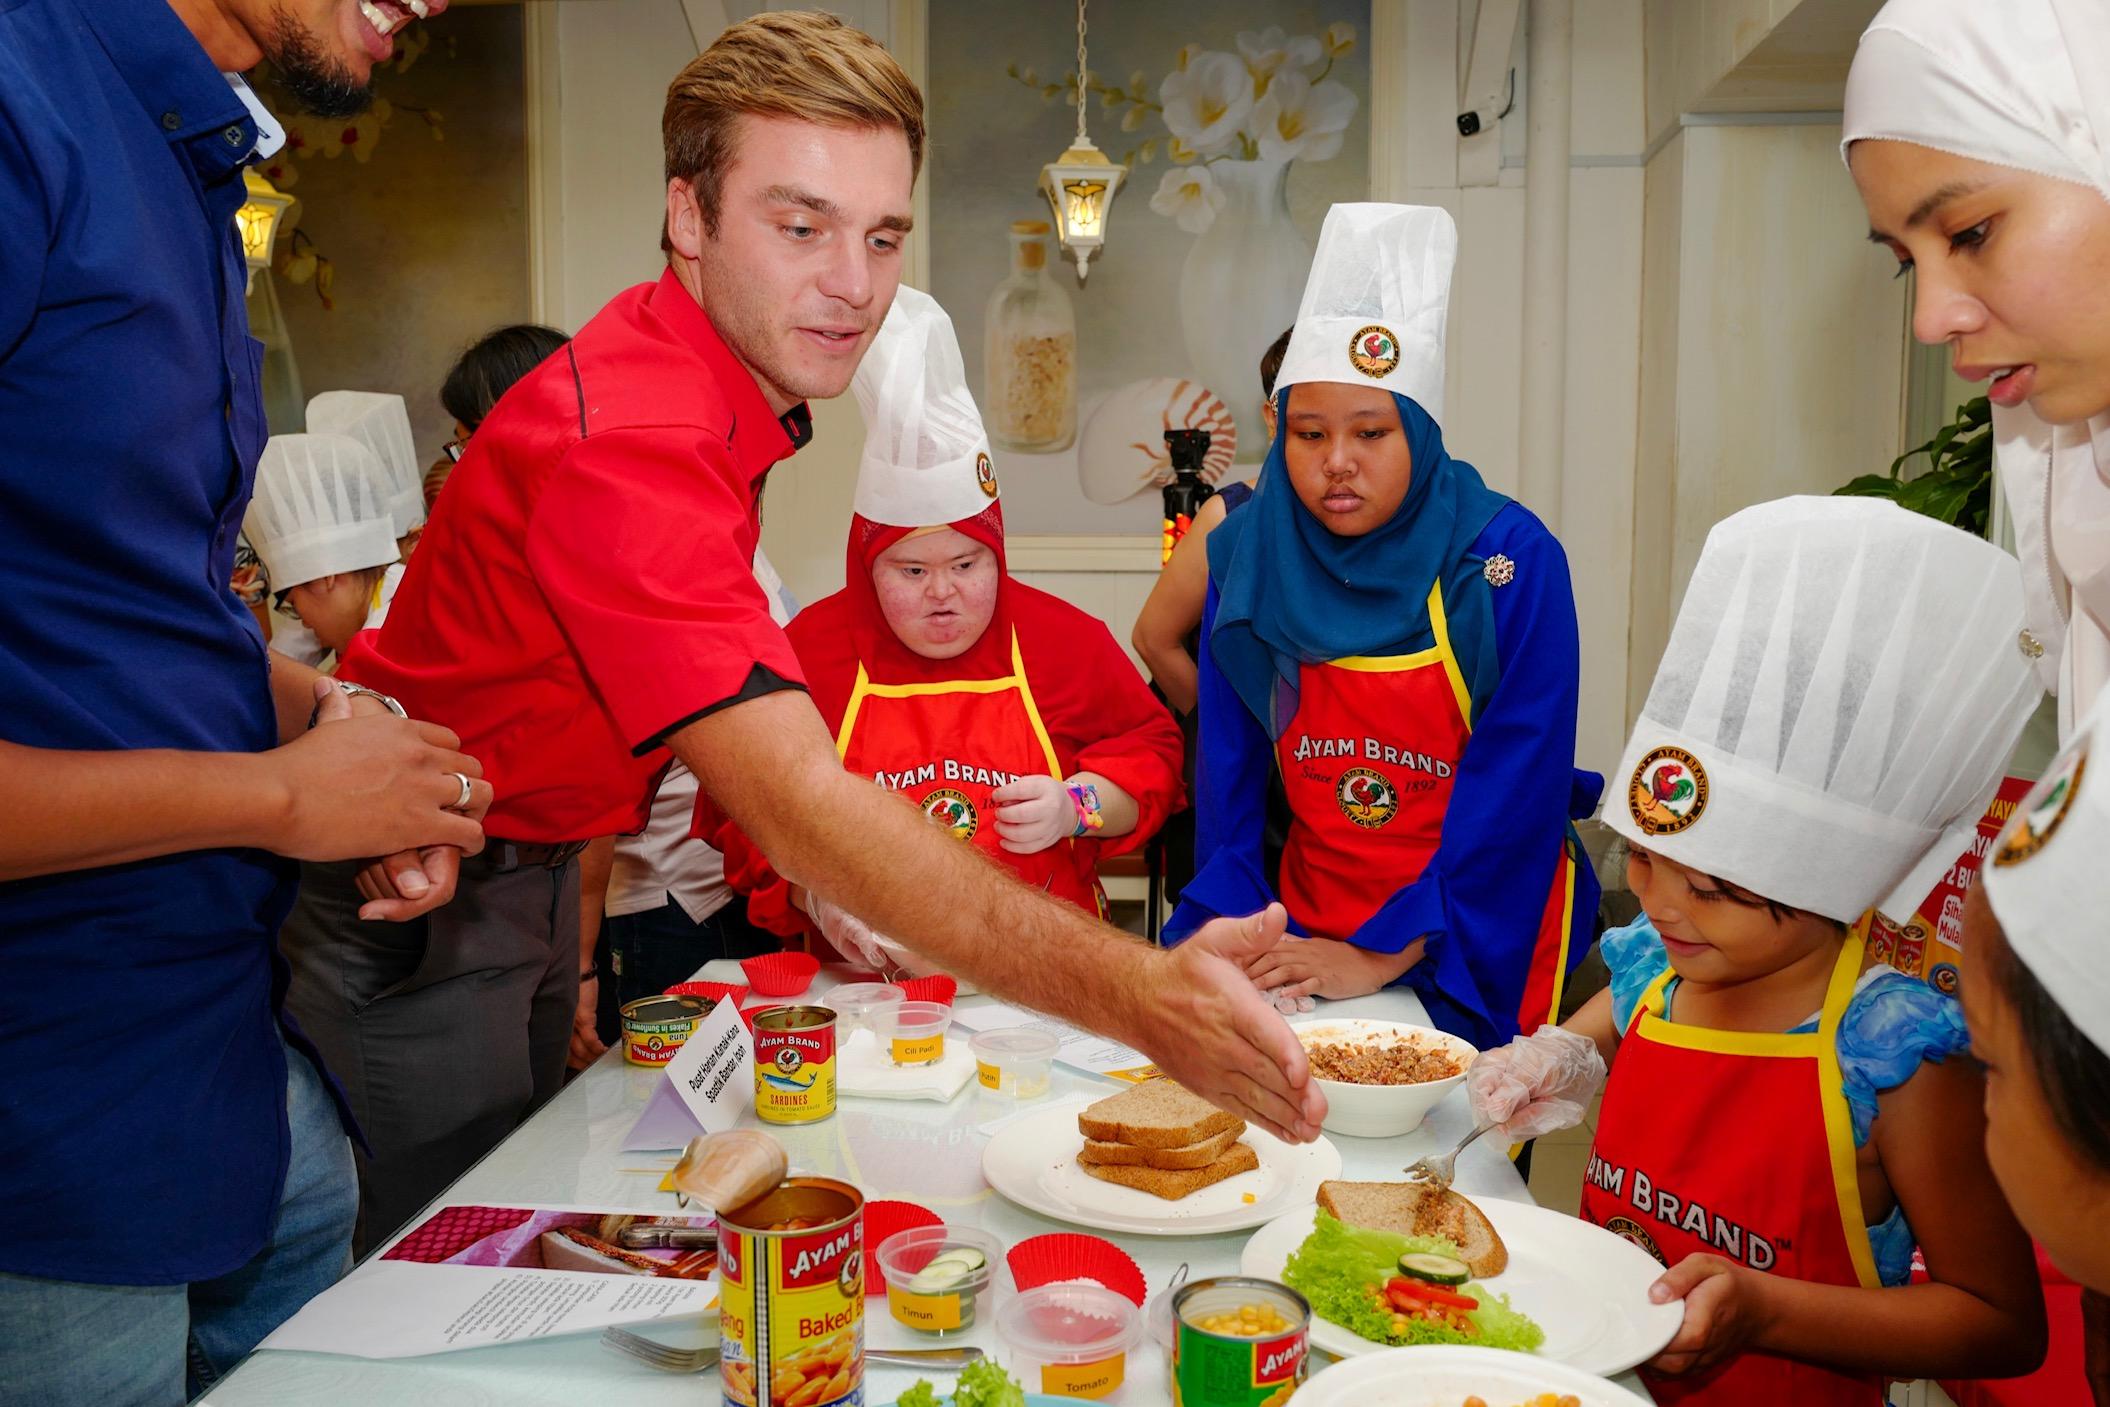 Ayam Brand promotes healthy eating habits among children